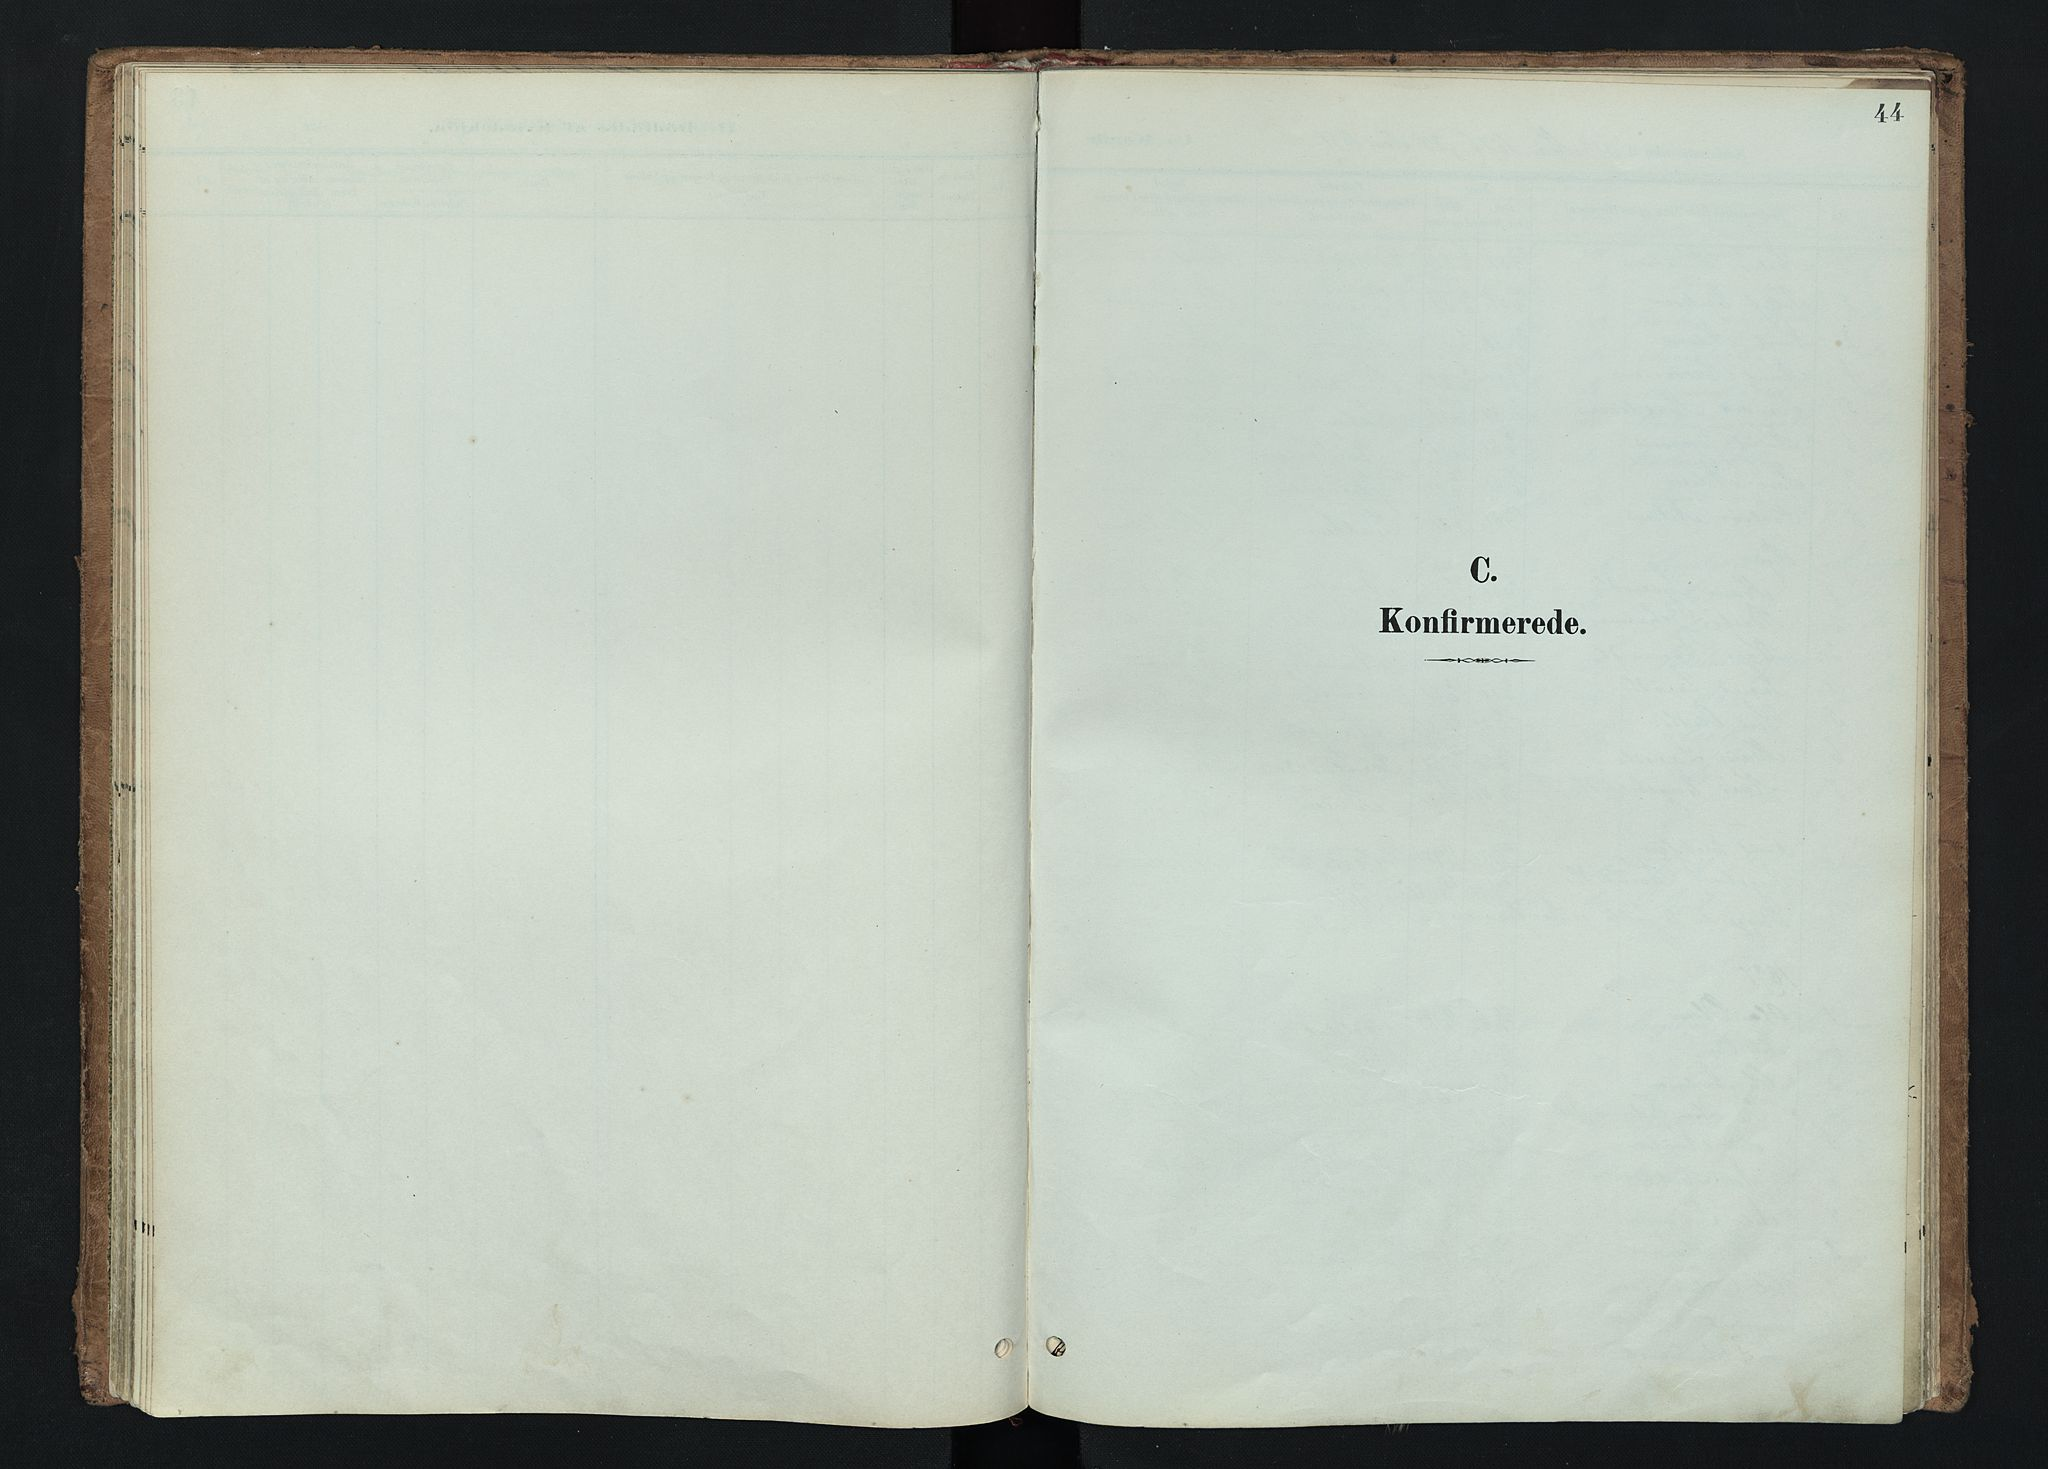 SAH, Nord-Aurdal prestekontor, Ministerialbok nr. 15, 1896-1914, s. 44